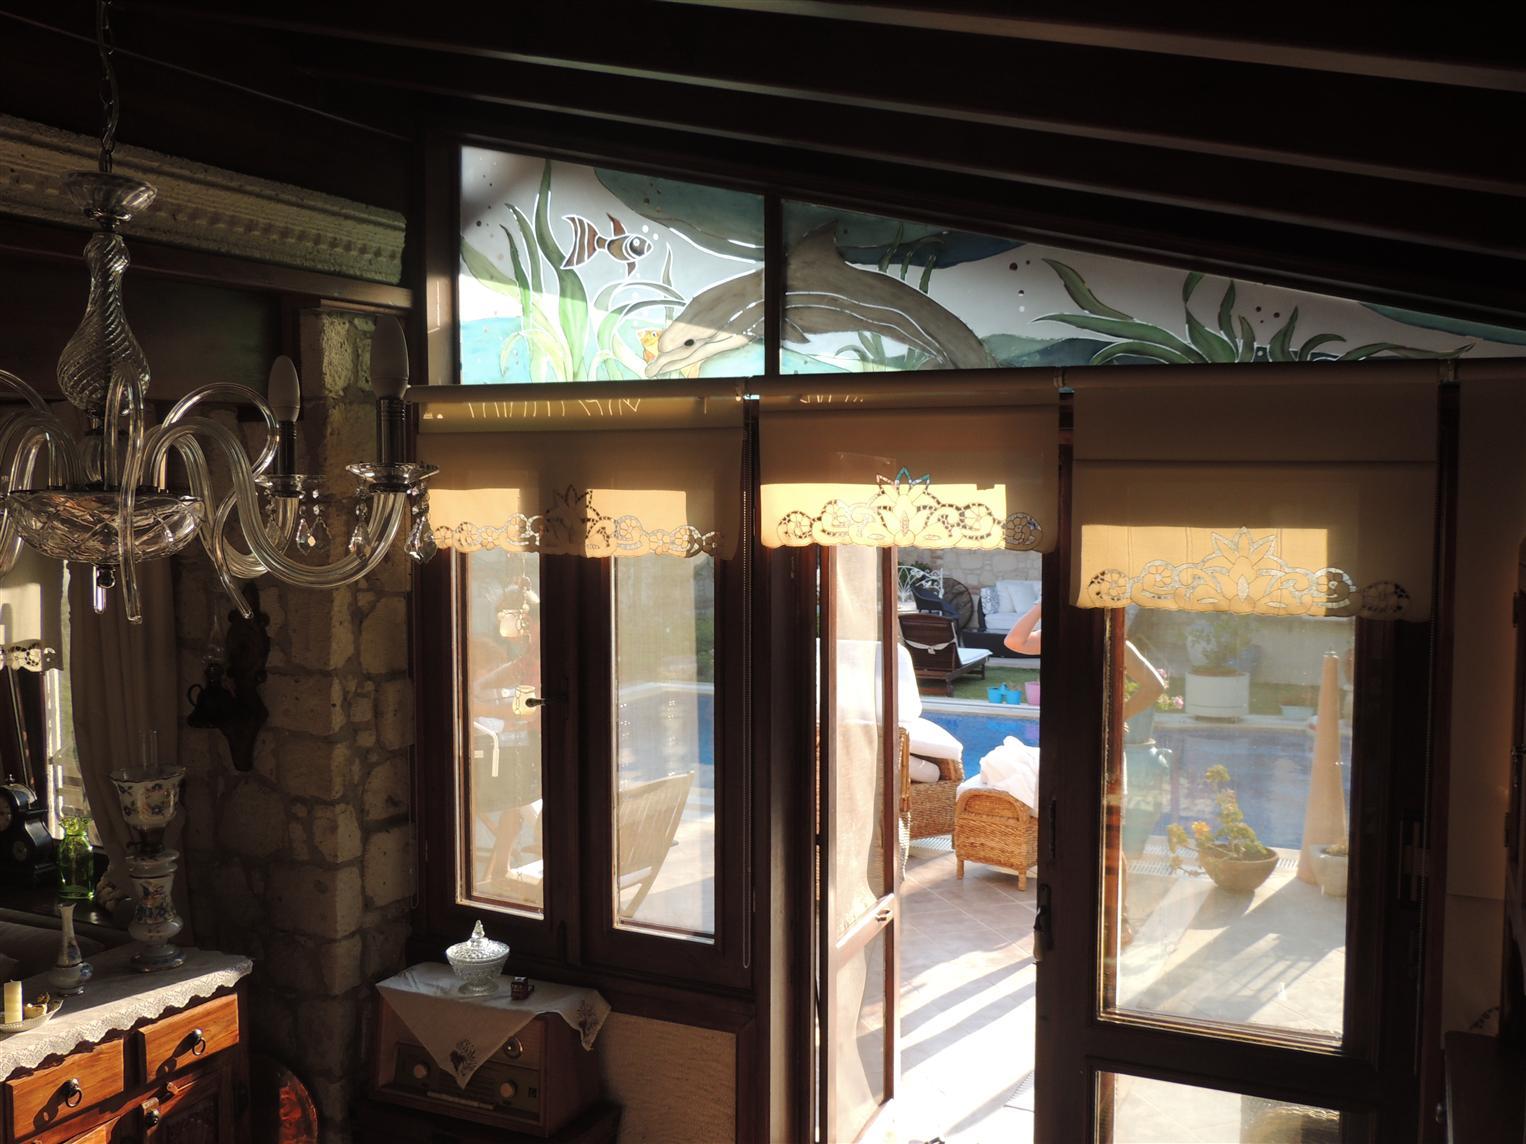 orhan-bey-villasi2015921162649915.jpg izmir vitray çalışması